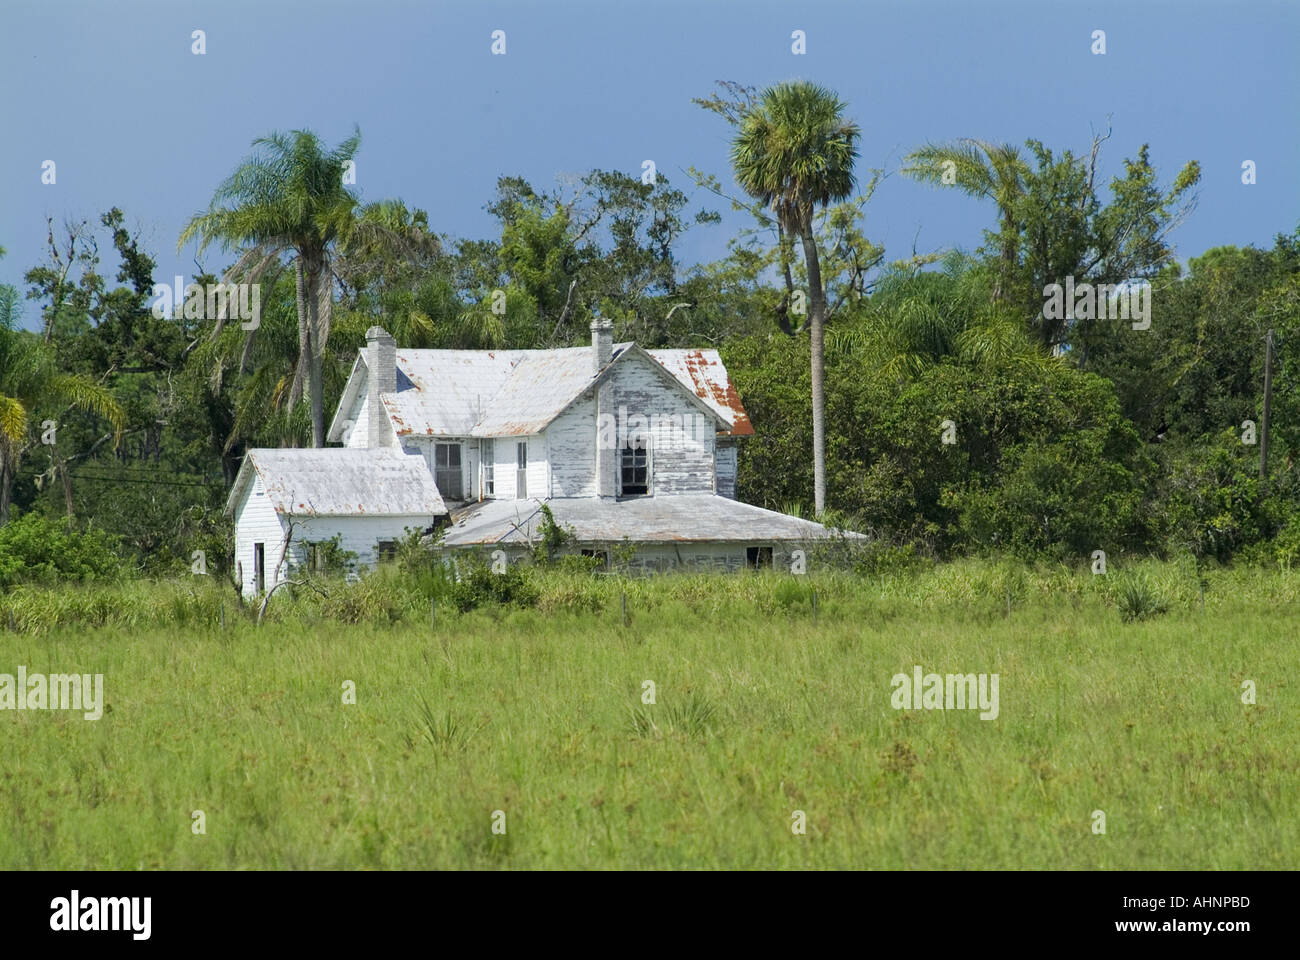 abandoned Florida Farm house old home Stock Photo: 4739772